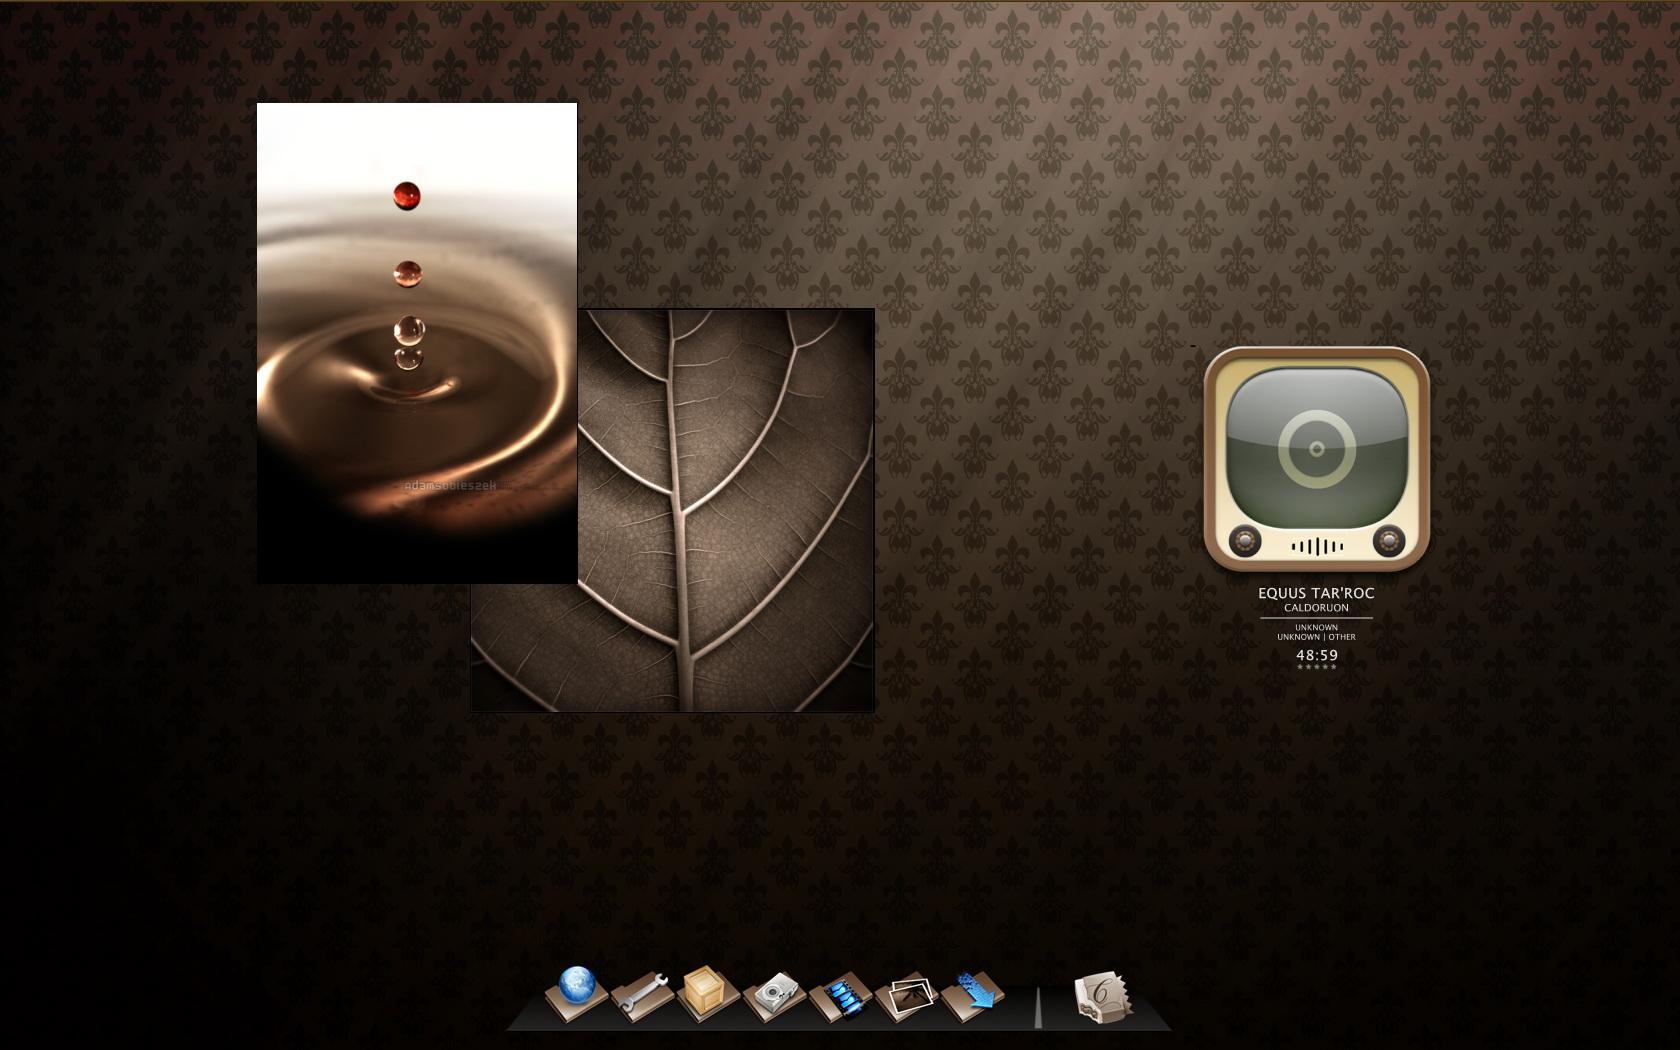 March - April 2009 Desktop Screenshots - Page 5 Desktop210309okuq